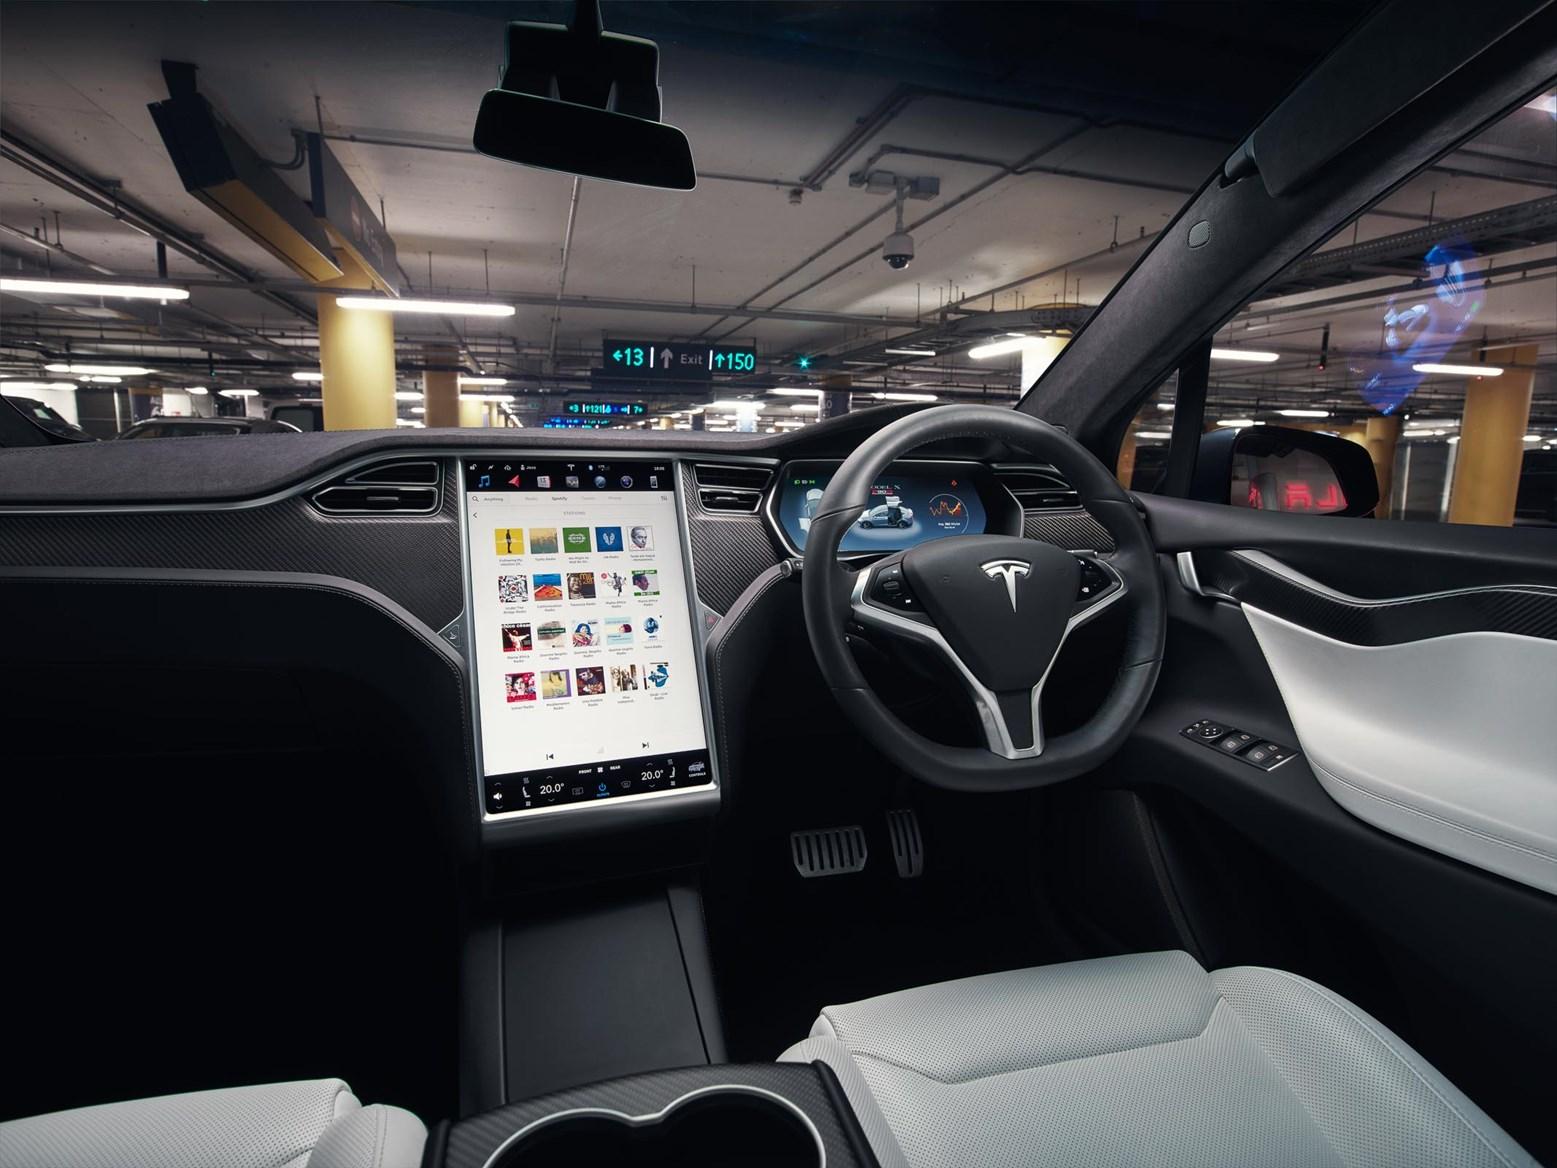 Tesla model x suv review 2016 parkers for Interieur tesla